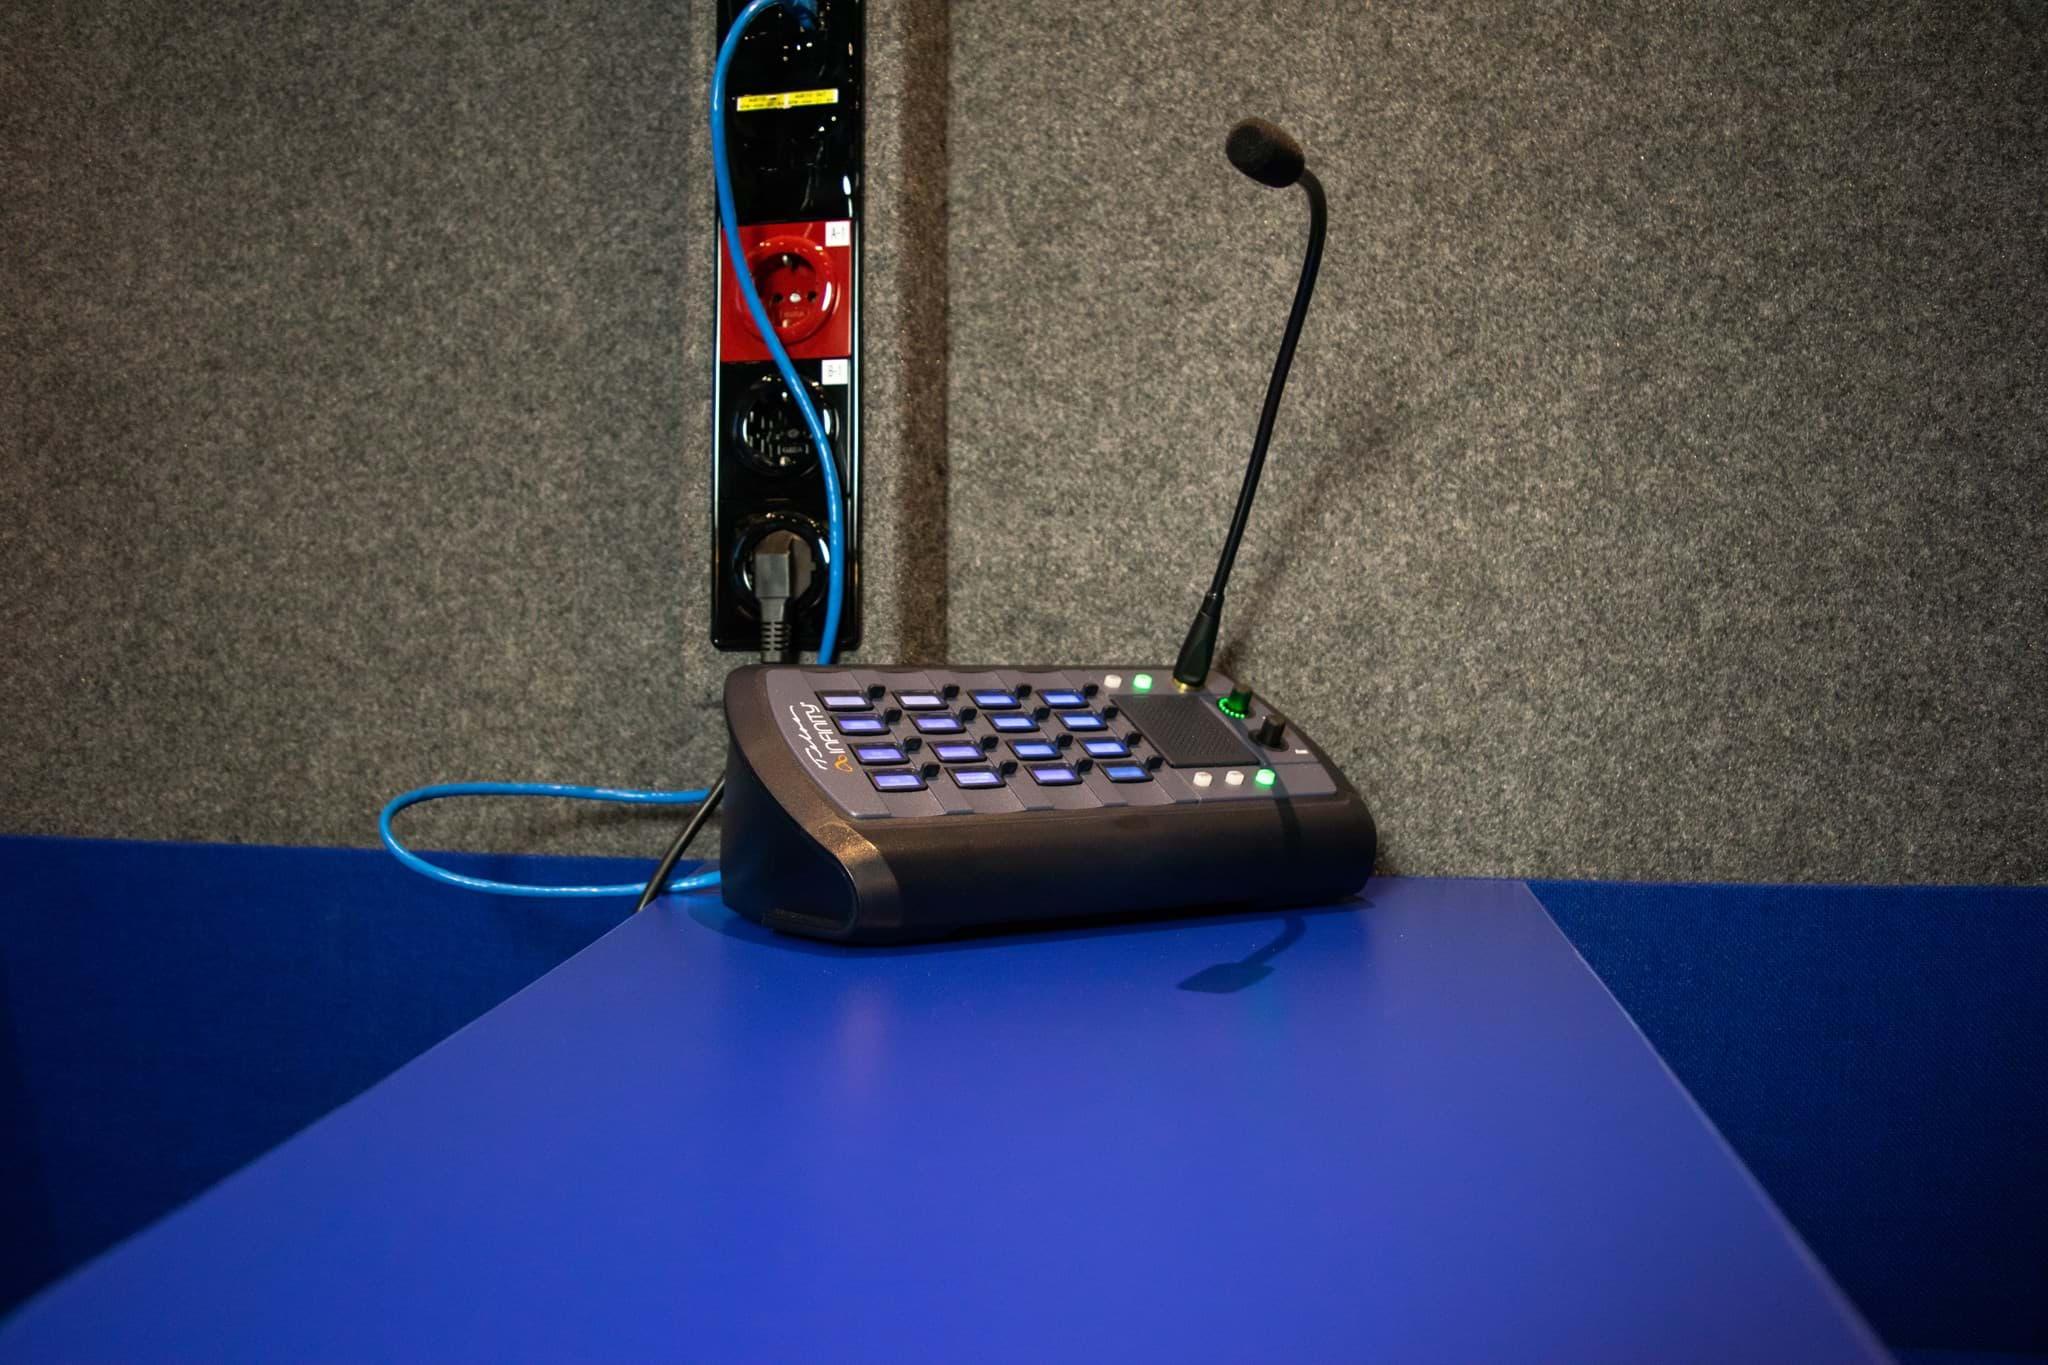 Rijnmond Reportagewagen binnenkant / Telos Infinity Intercom / OB van / Triple Audio